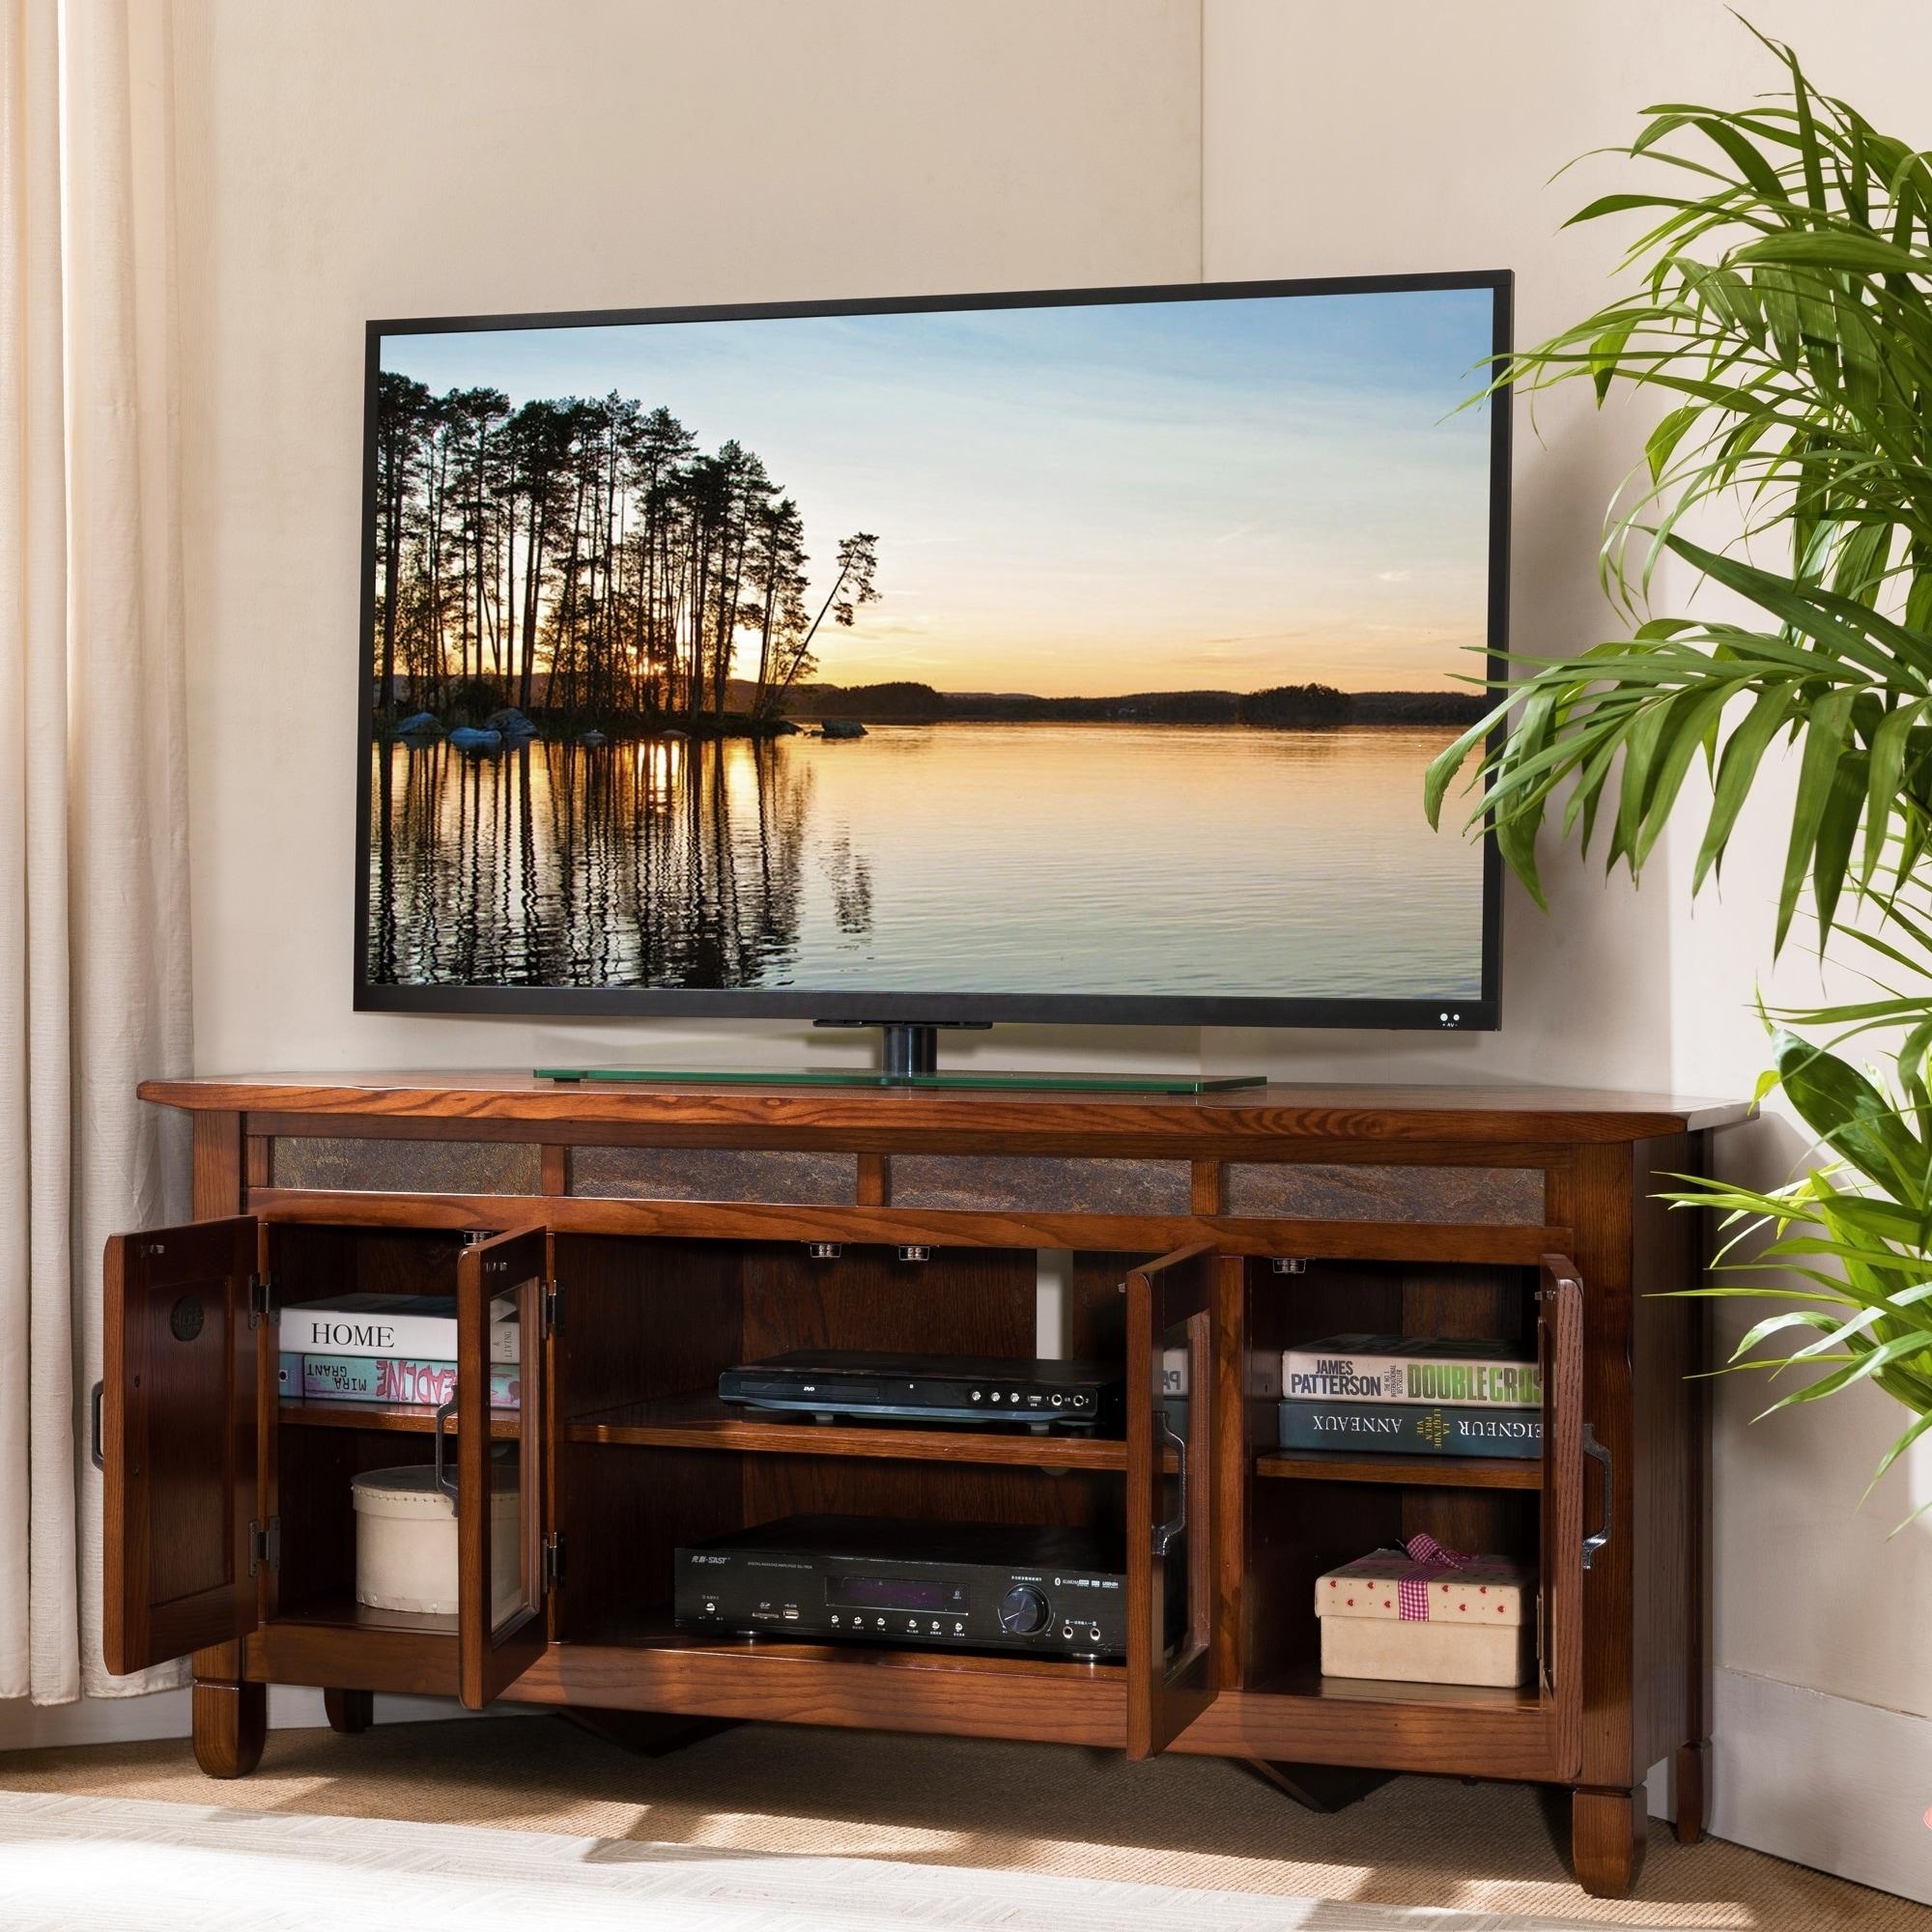 Shop Rustic Oak Wood Slat Tile 56 Inch Corner Tv Stand Free